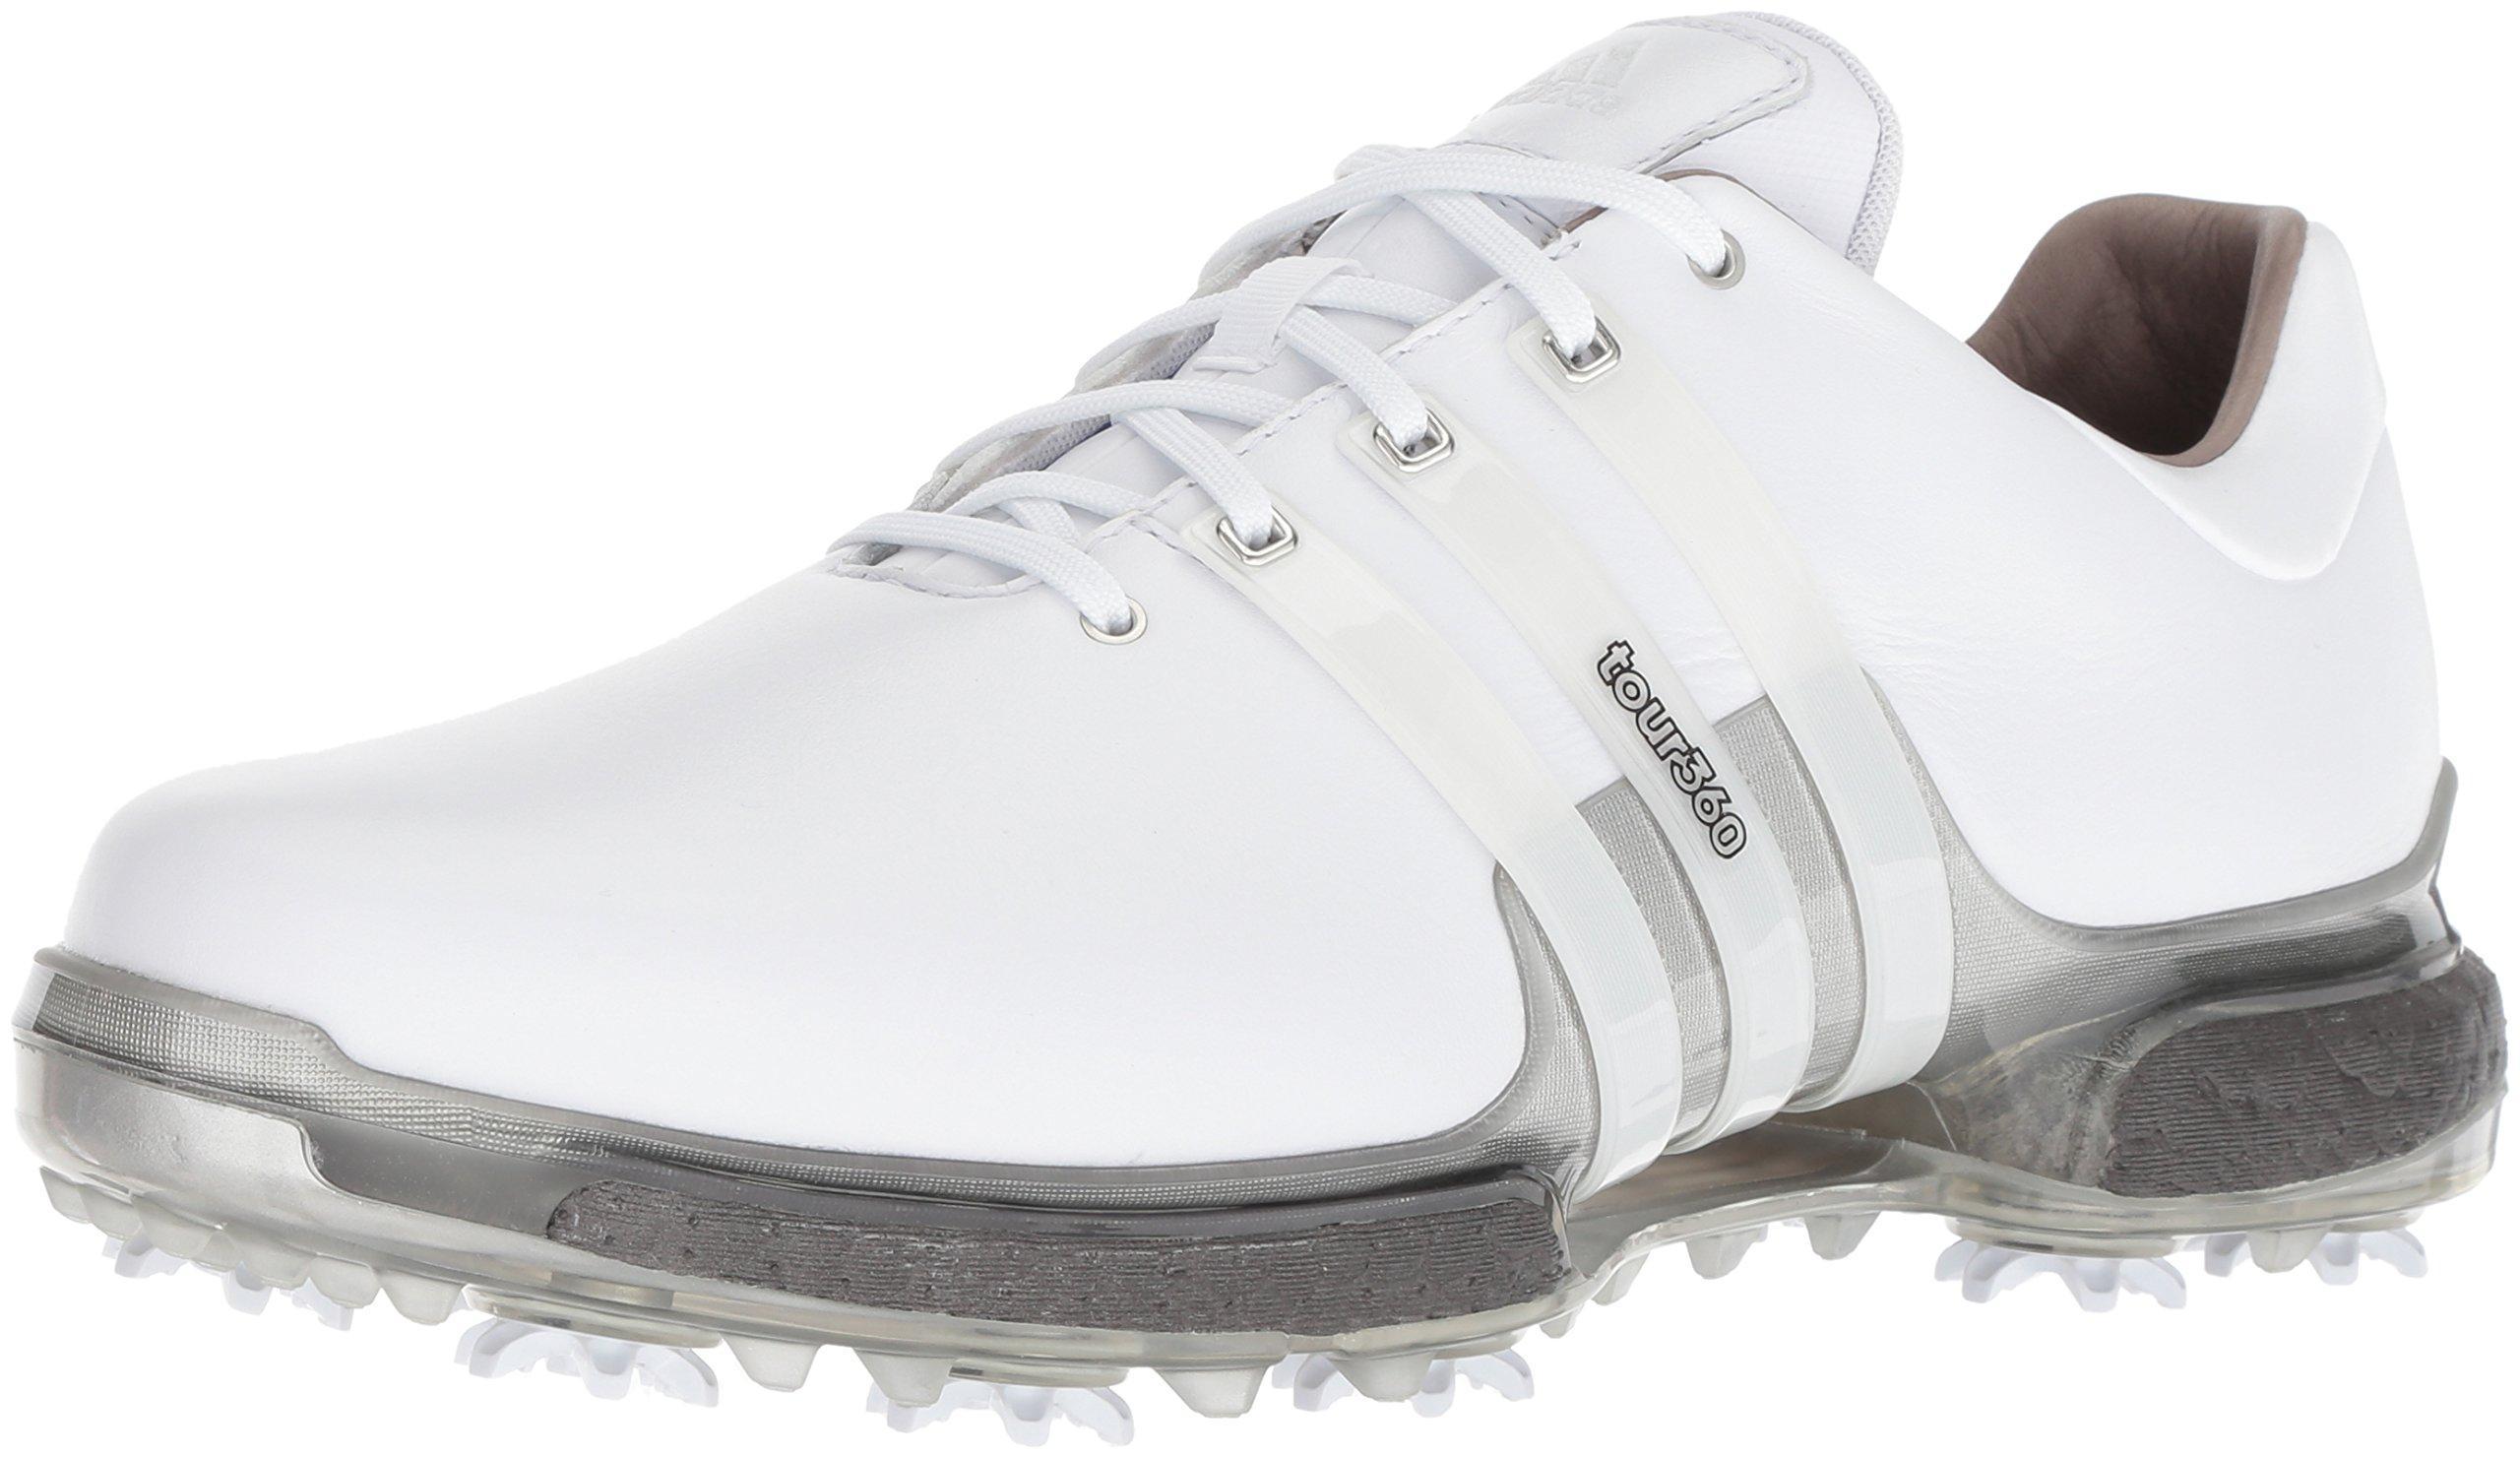 adidas Leather Tour 360 2.0 Golf Shoe